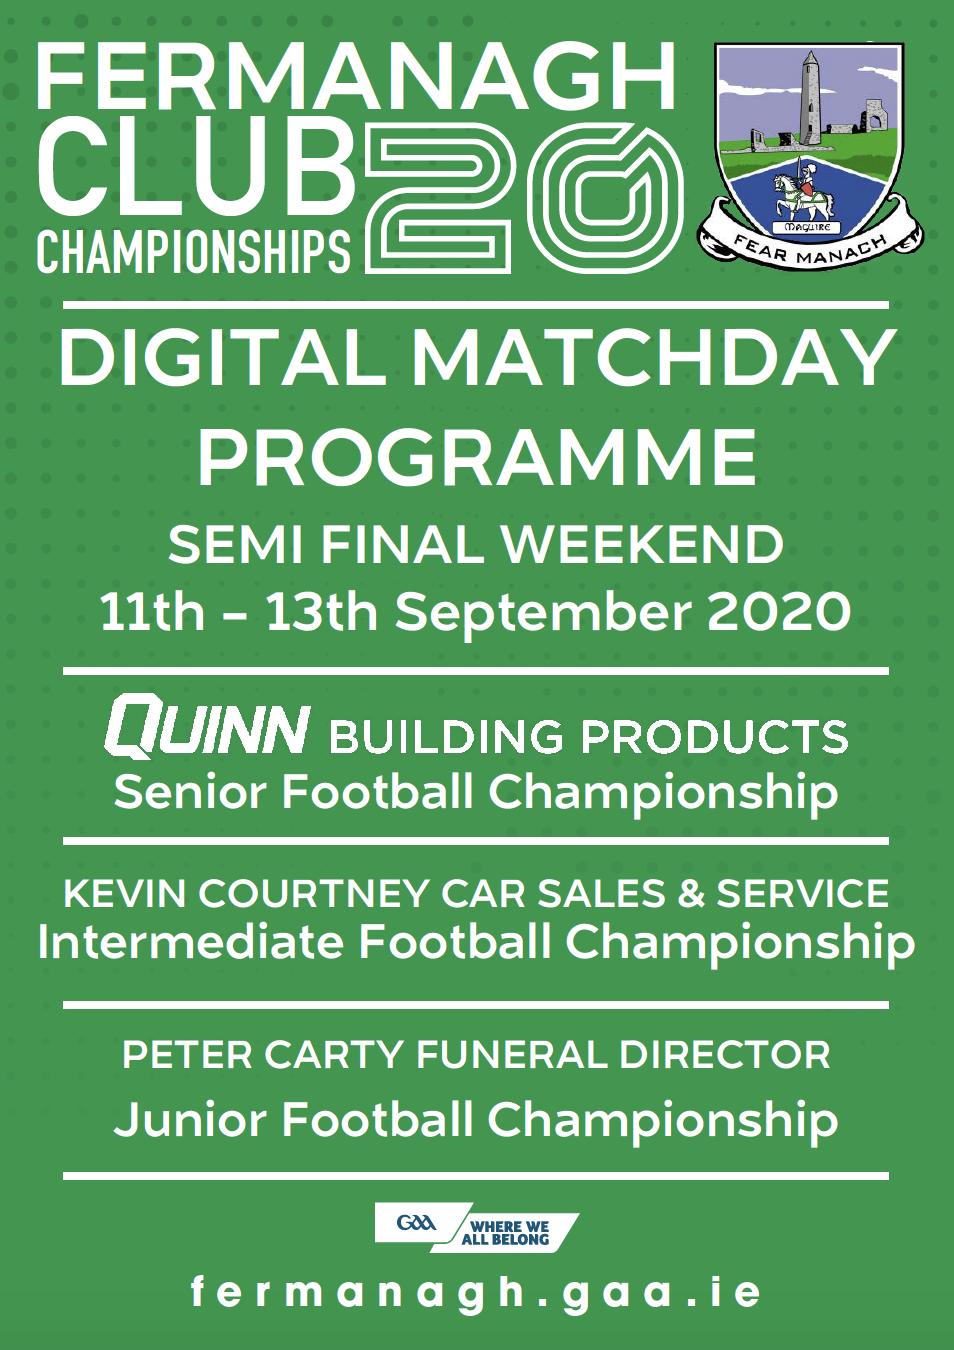 Semi Final Weekend – Club Championship Programme